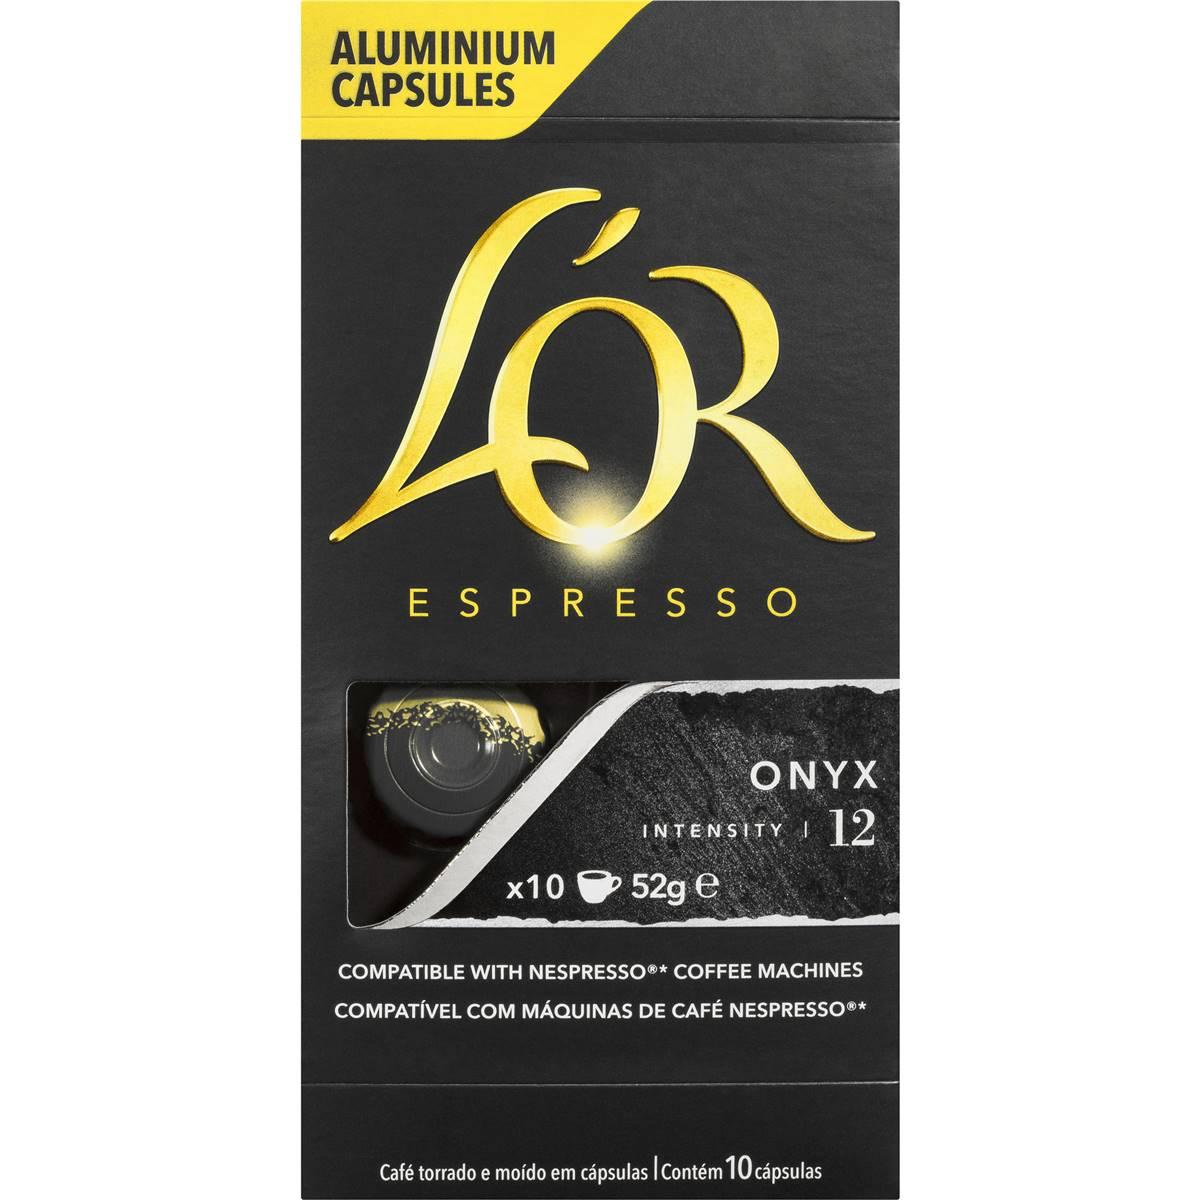 L'or Espresso Onyx Coffee Capsule